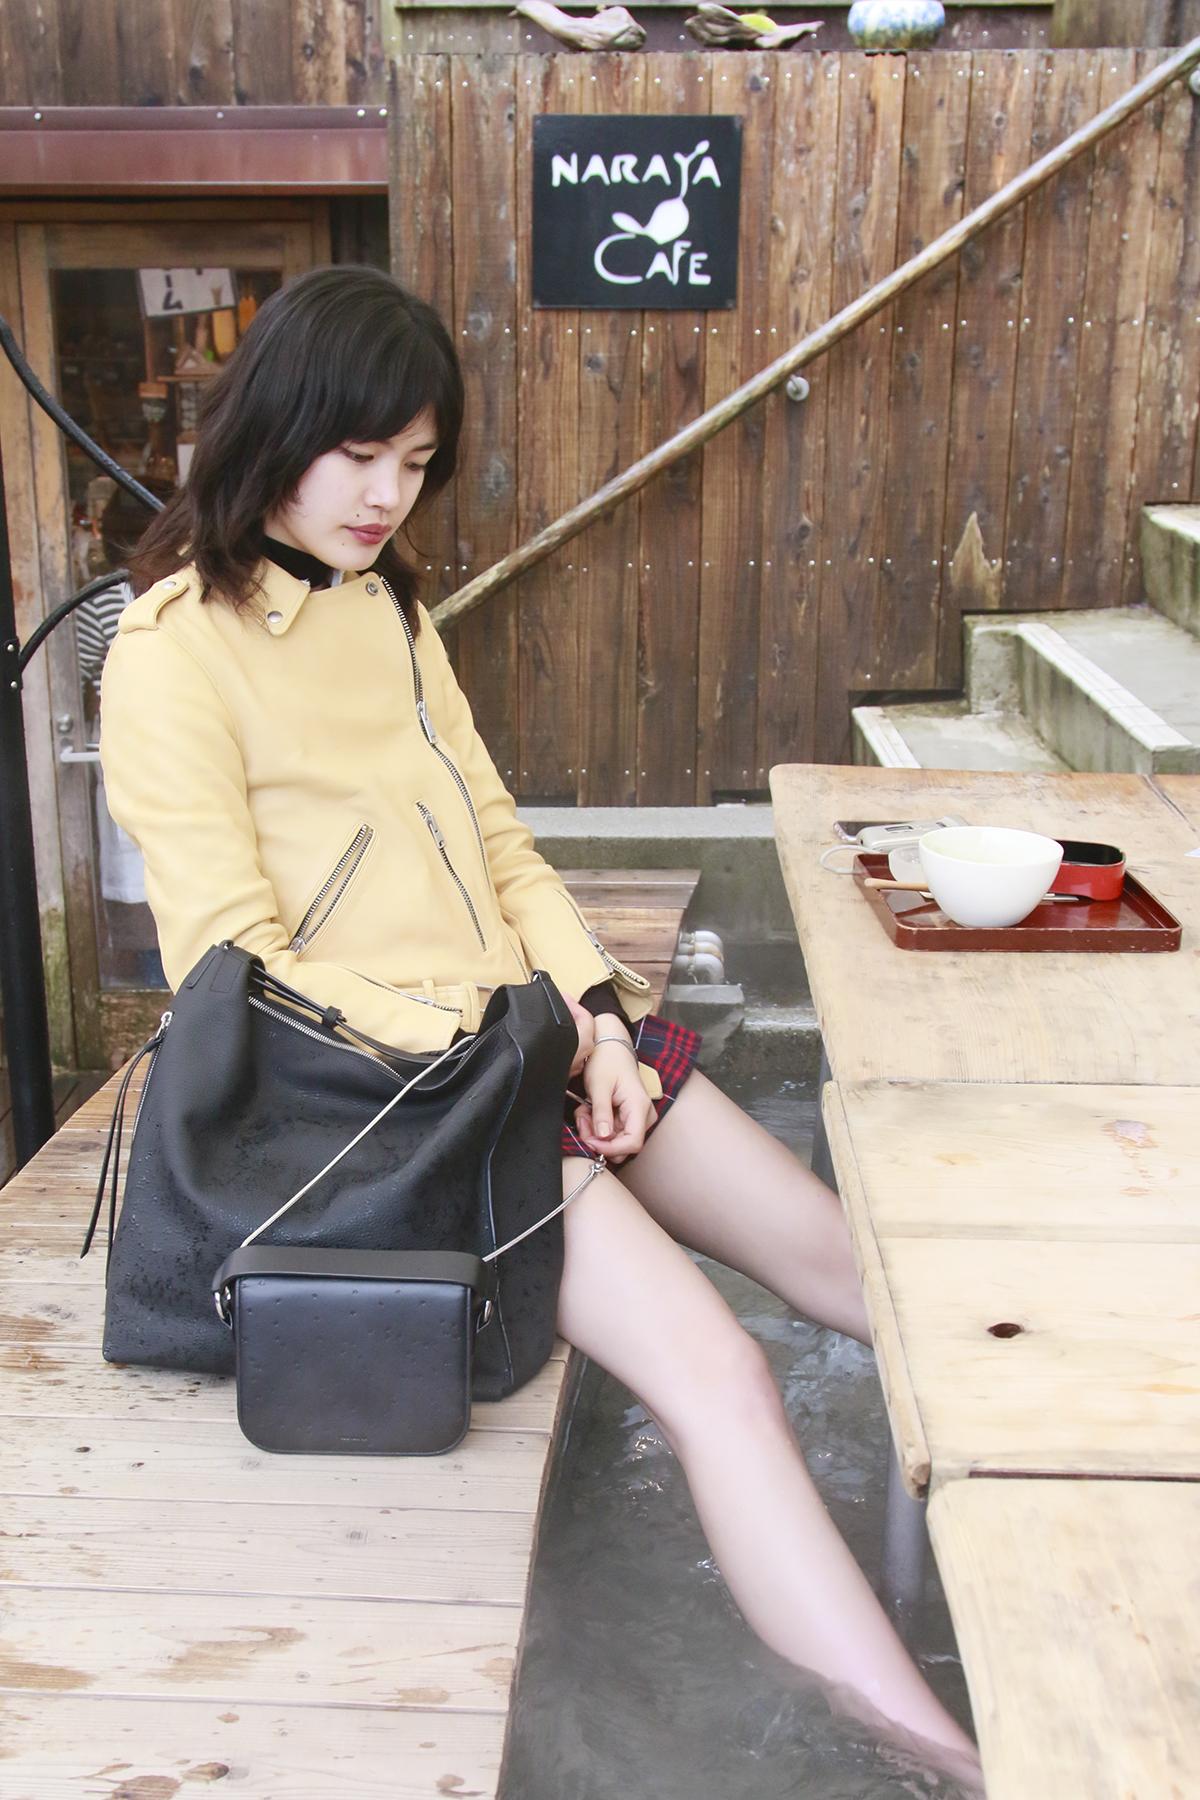 ALLSAINTS_Rina Fukushi_23